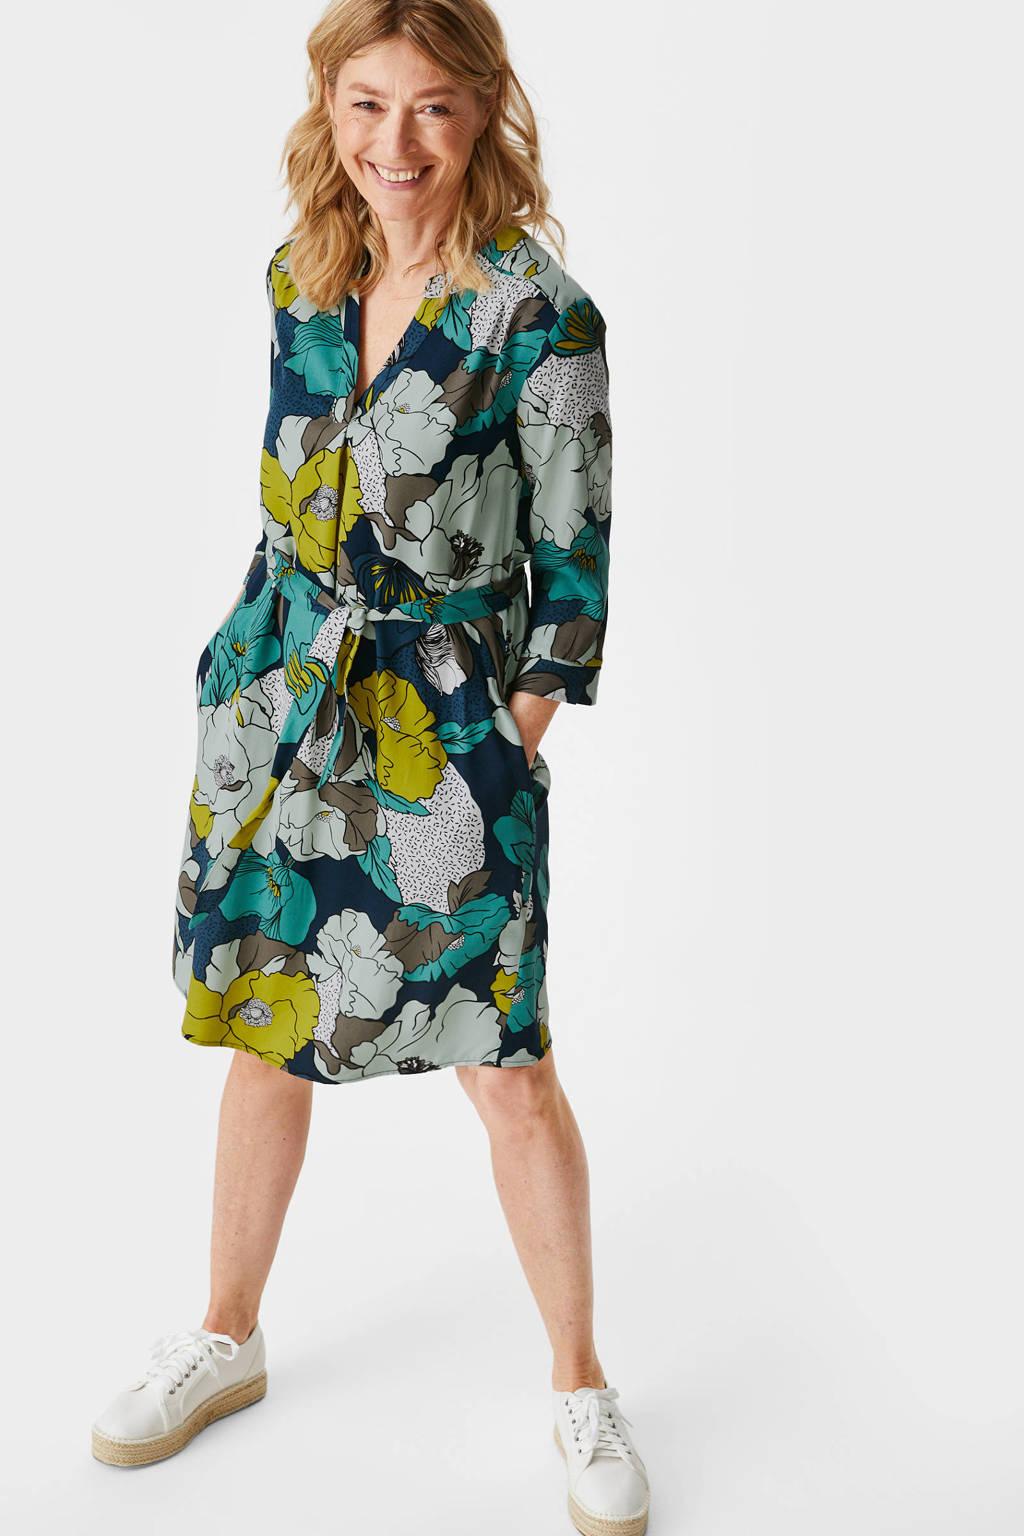 C&A Canda Premium jurk met all over print en ceintuur donkerblauw/geel, Donkerblauw/geel